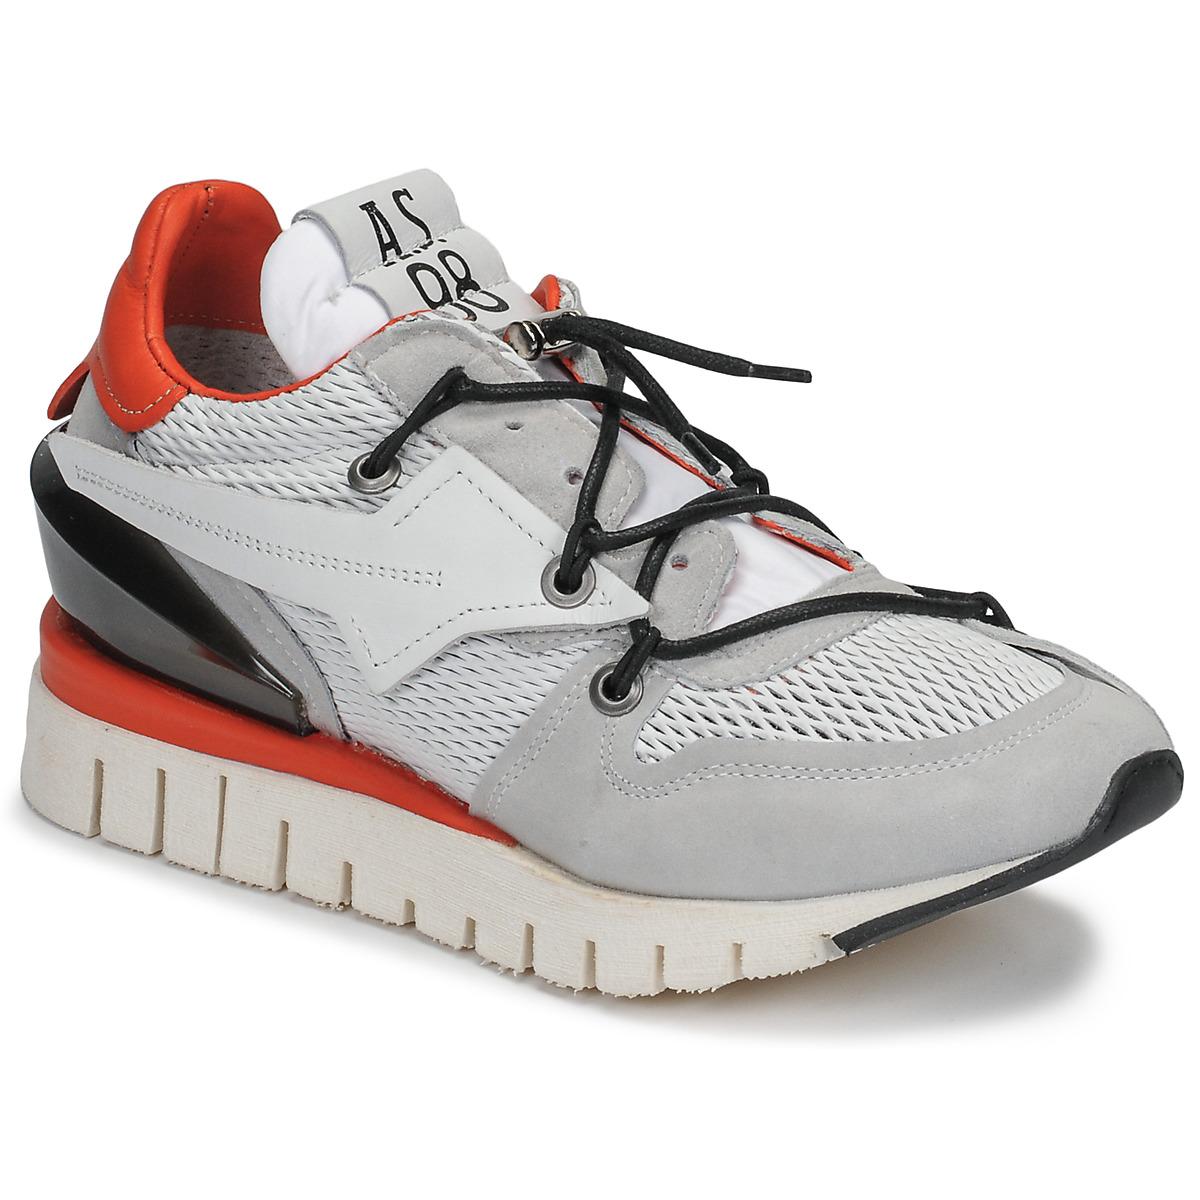 Sneakers Airstep / A.S.98  DENASTAR